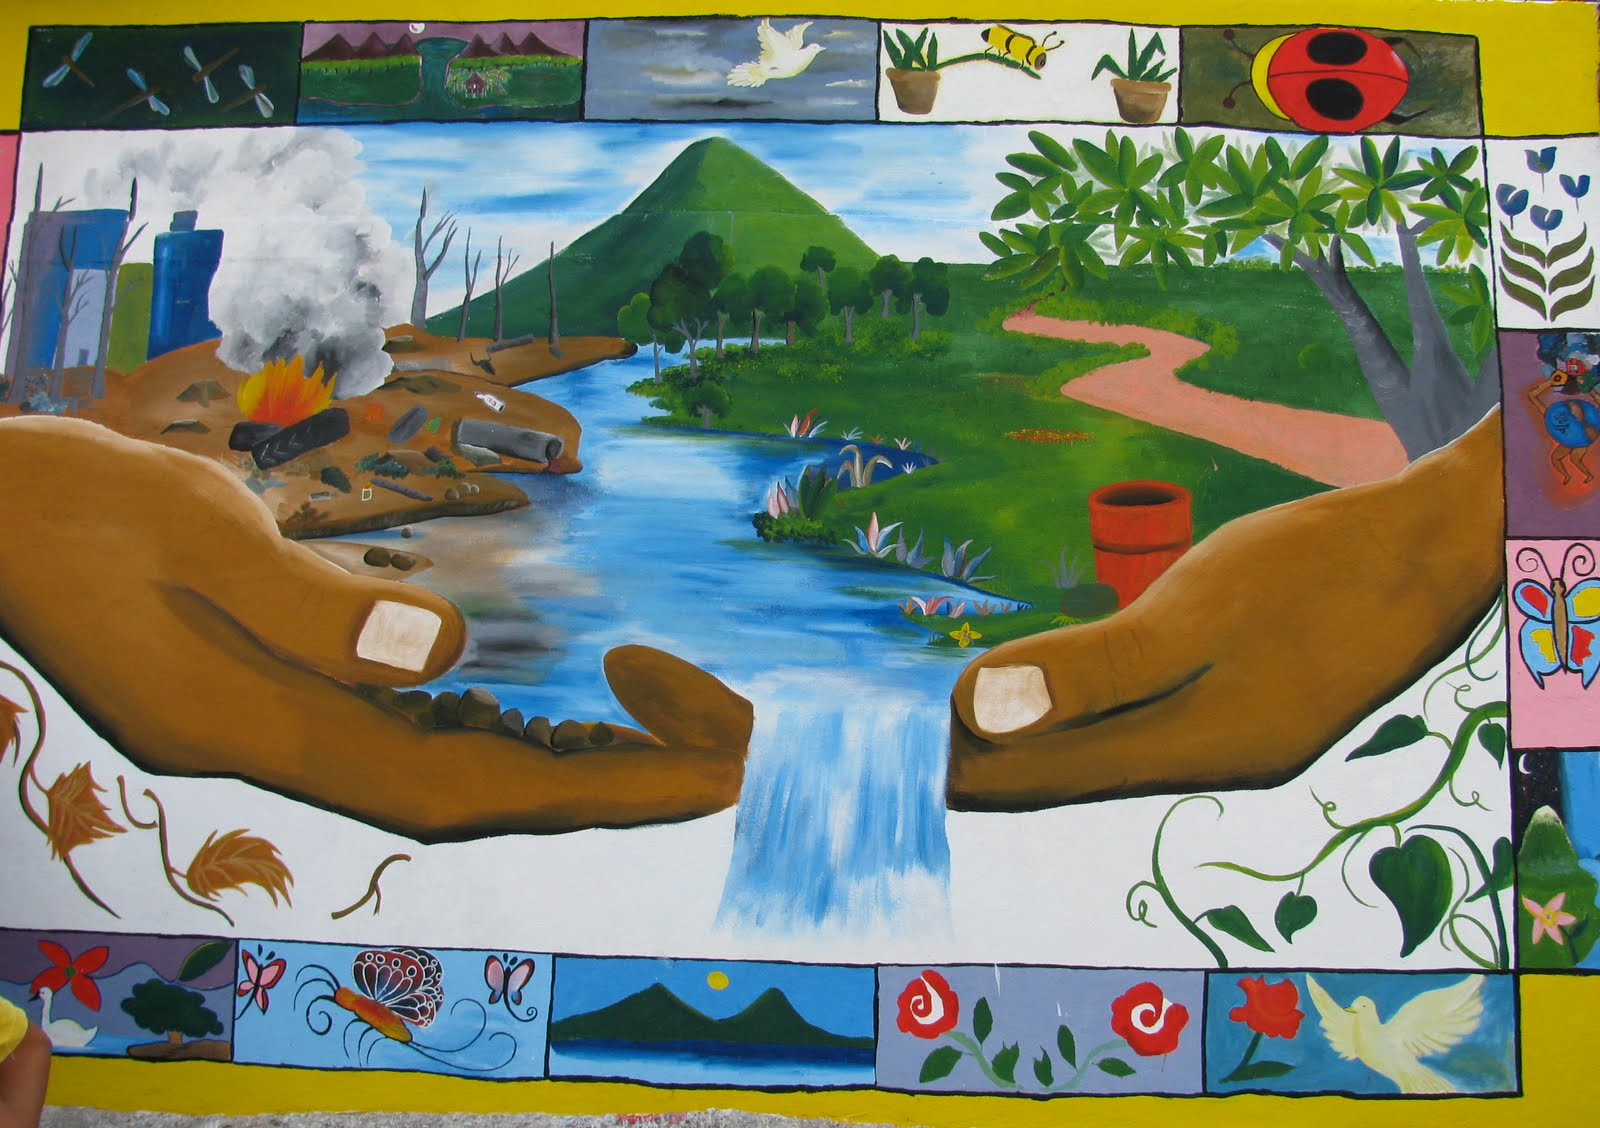 Cantera community center of ciudad sandino managua for Mural nicaraguense